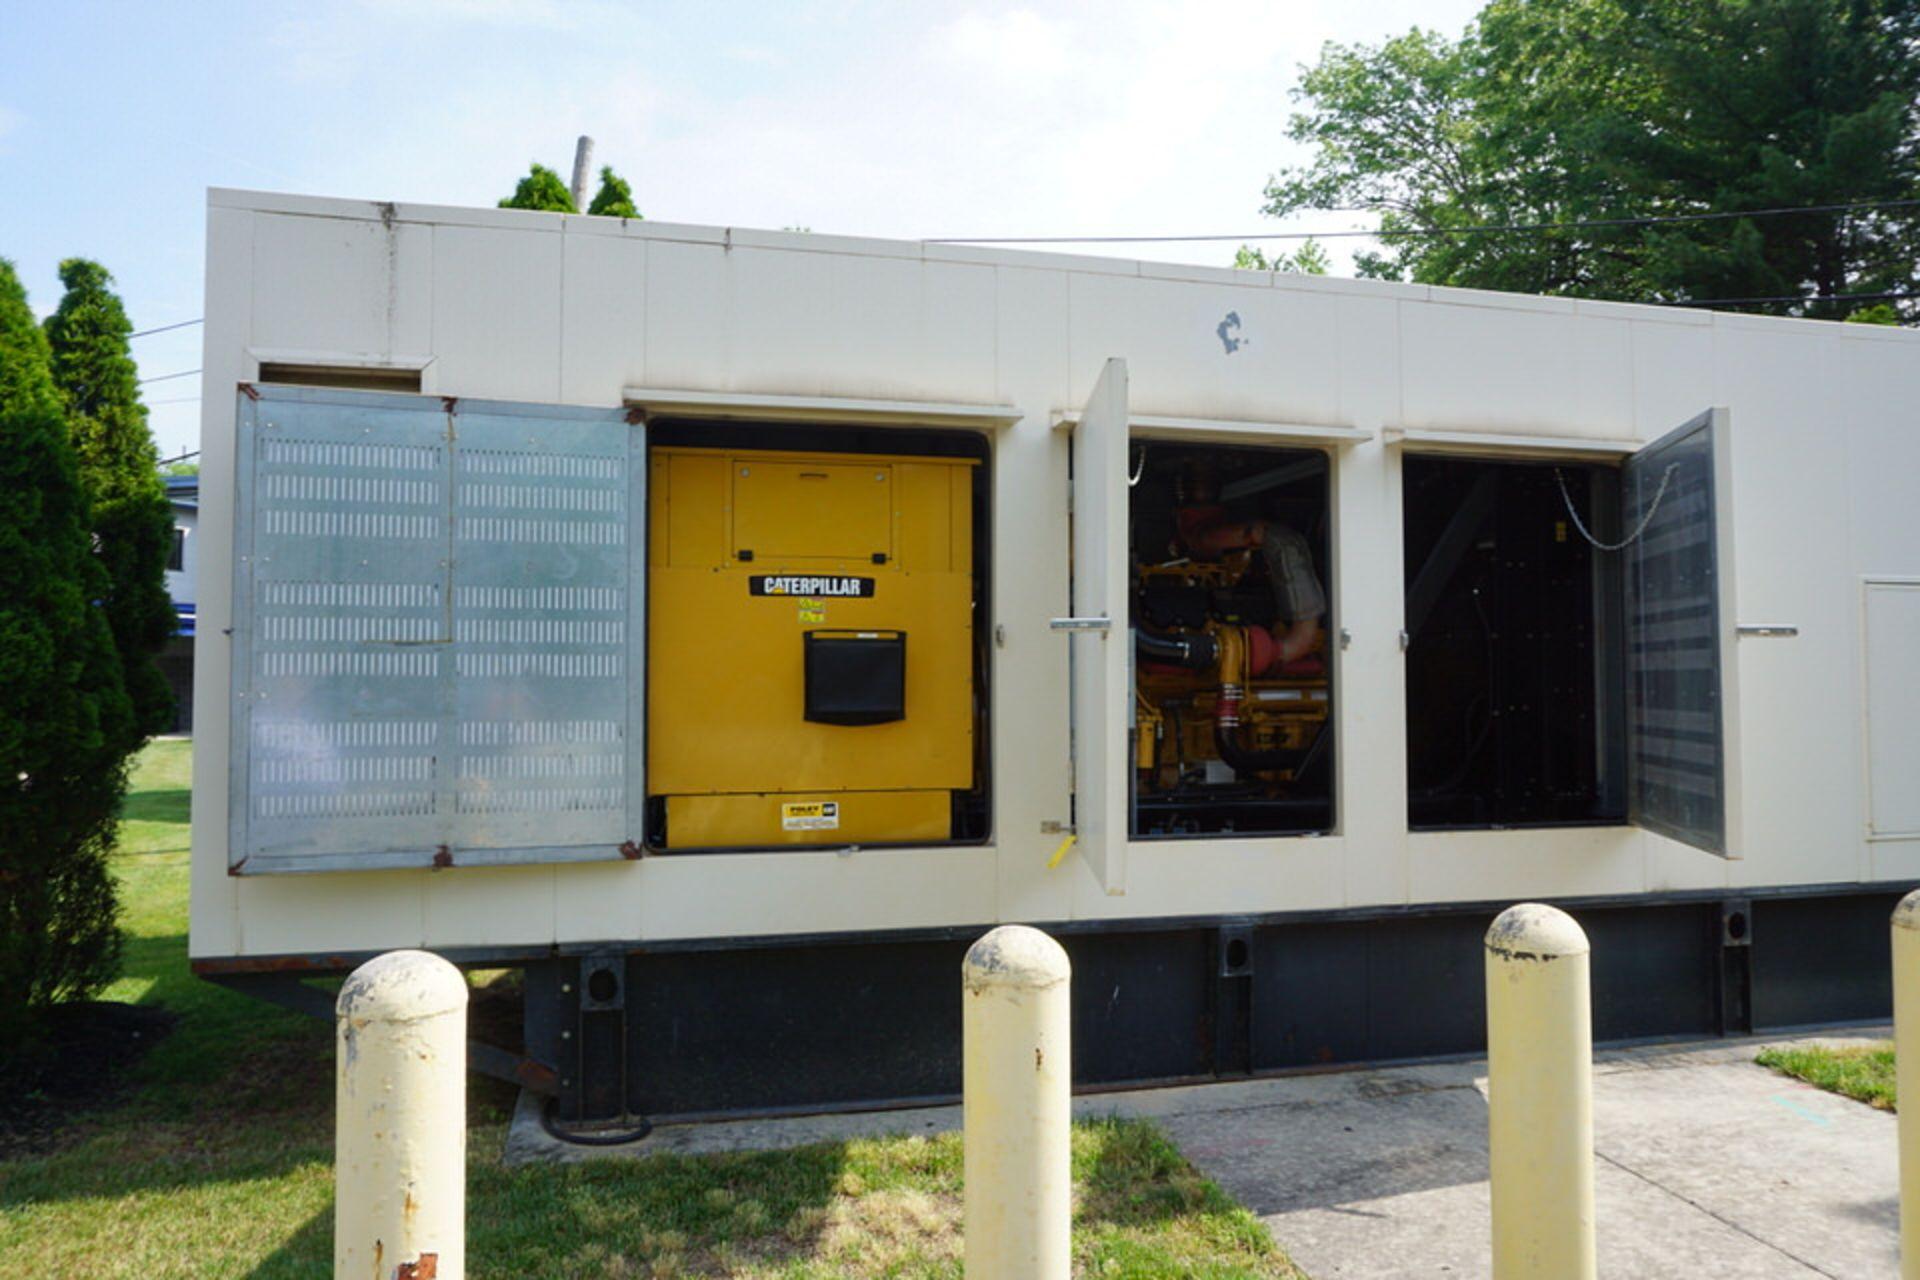 2007 CATERPILLAR BACK UP GENERATOR, ENGINE MODEL: C32 W/ EMCP3.3 CONTROL, 173.9 HOURS, 1250 KVA - Image 14 of 25